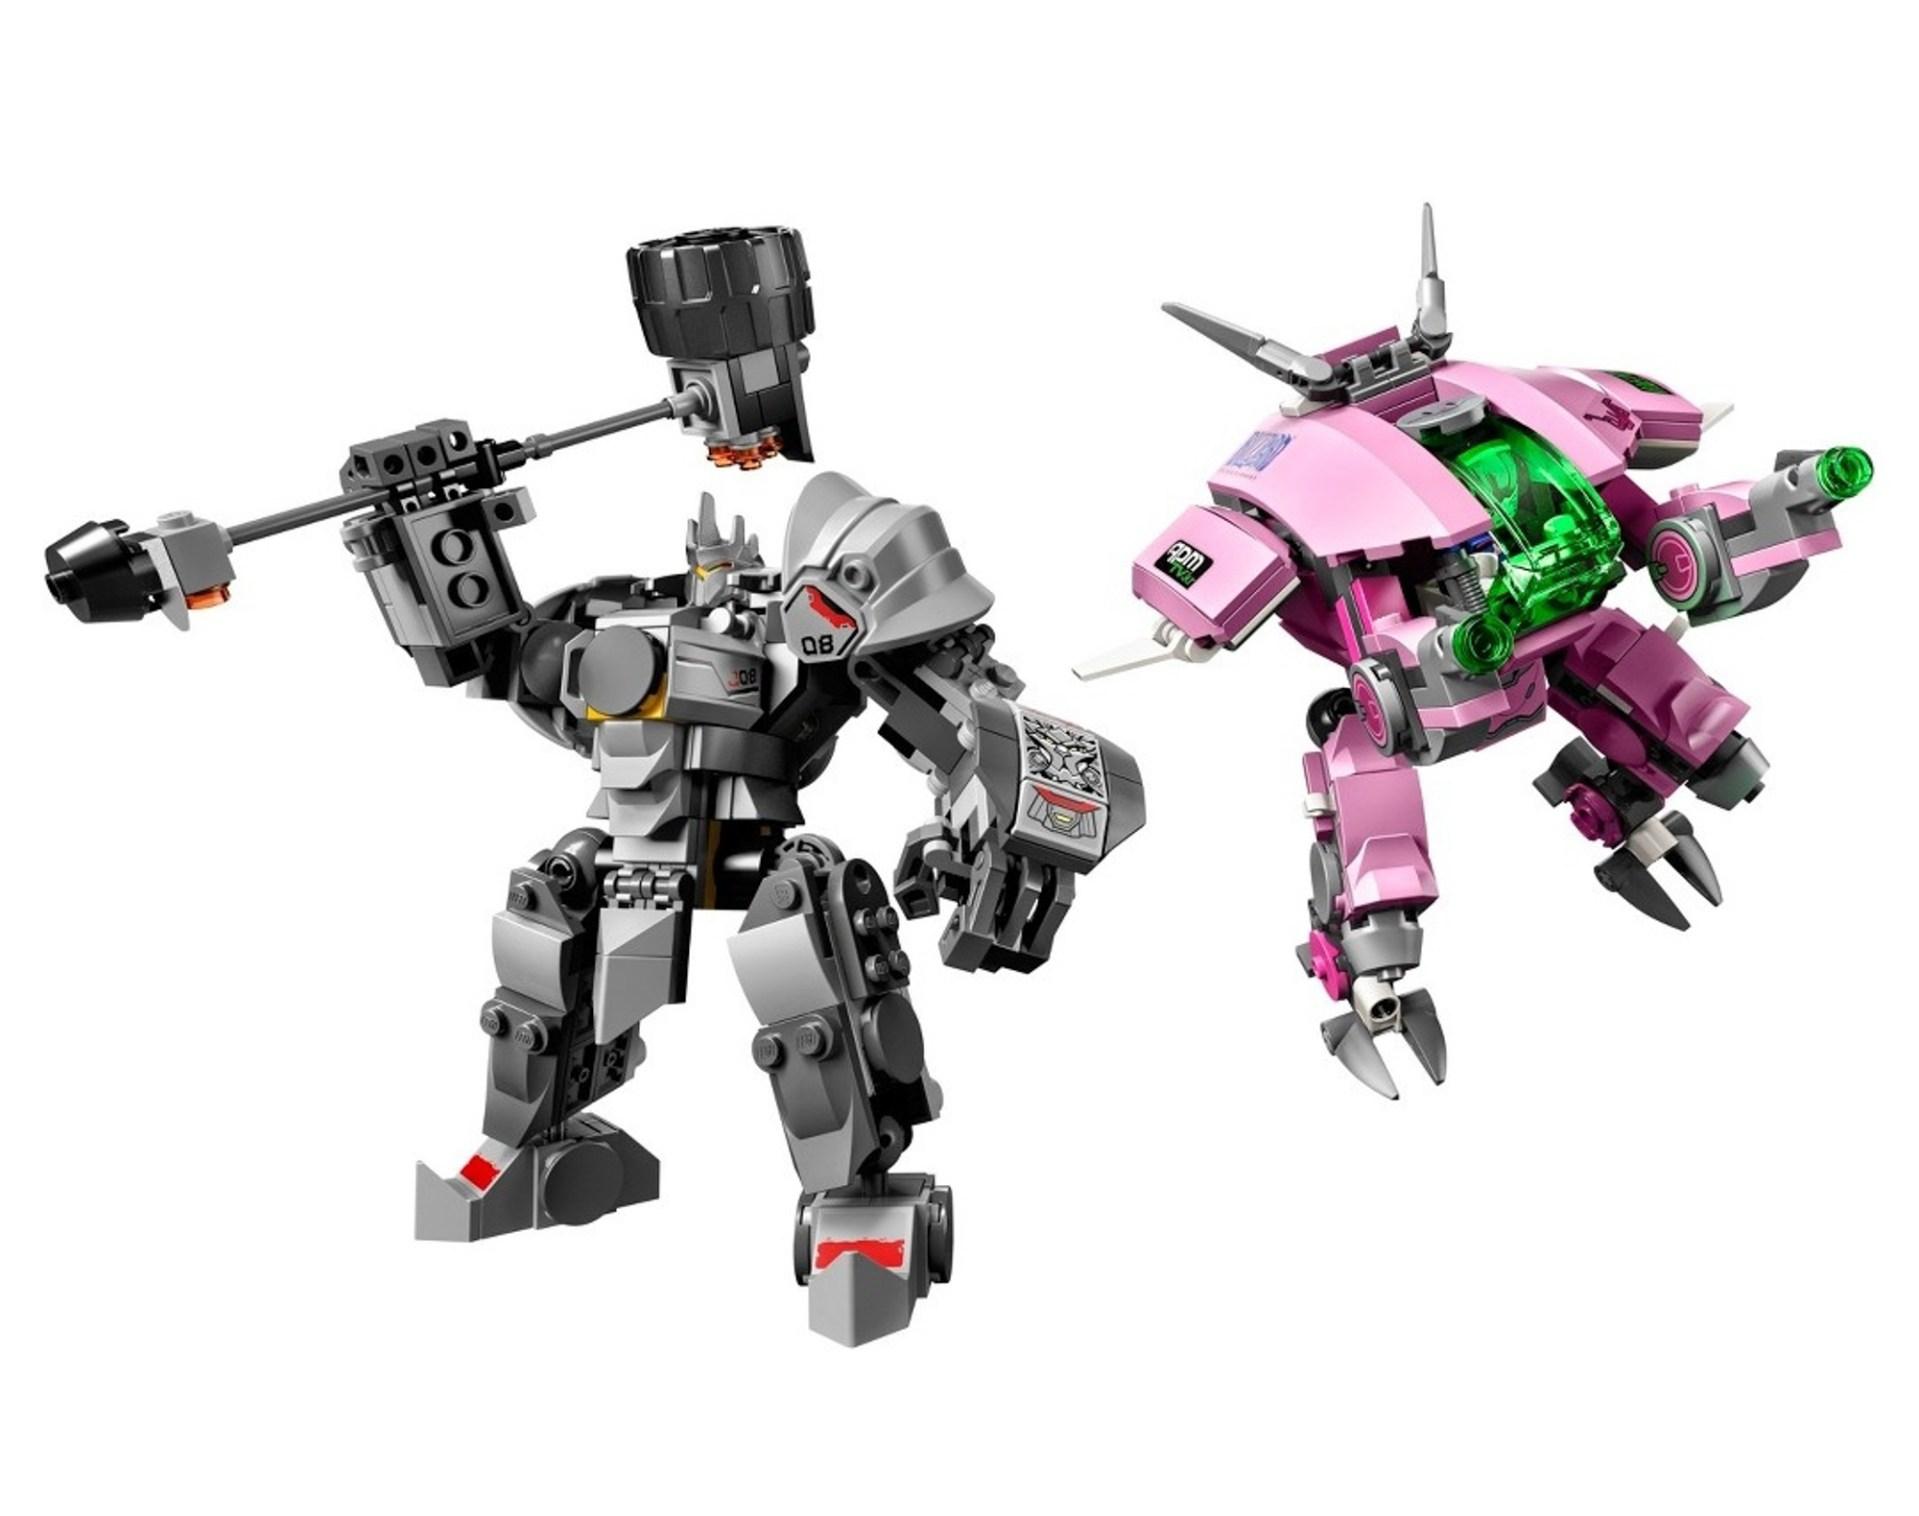 Presentati i set ufficiali LEGO Overwatch